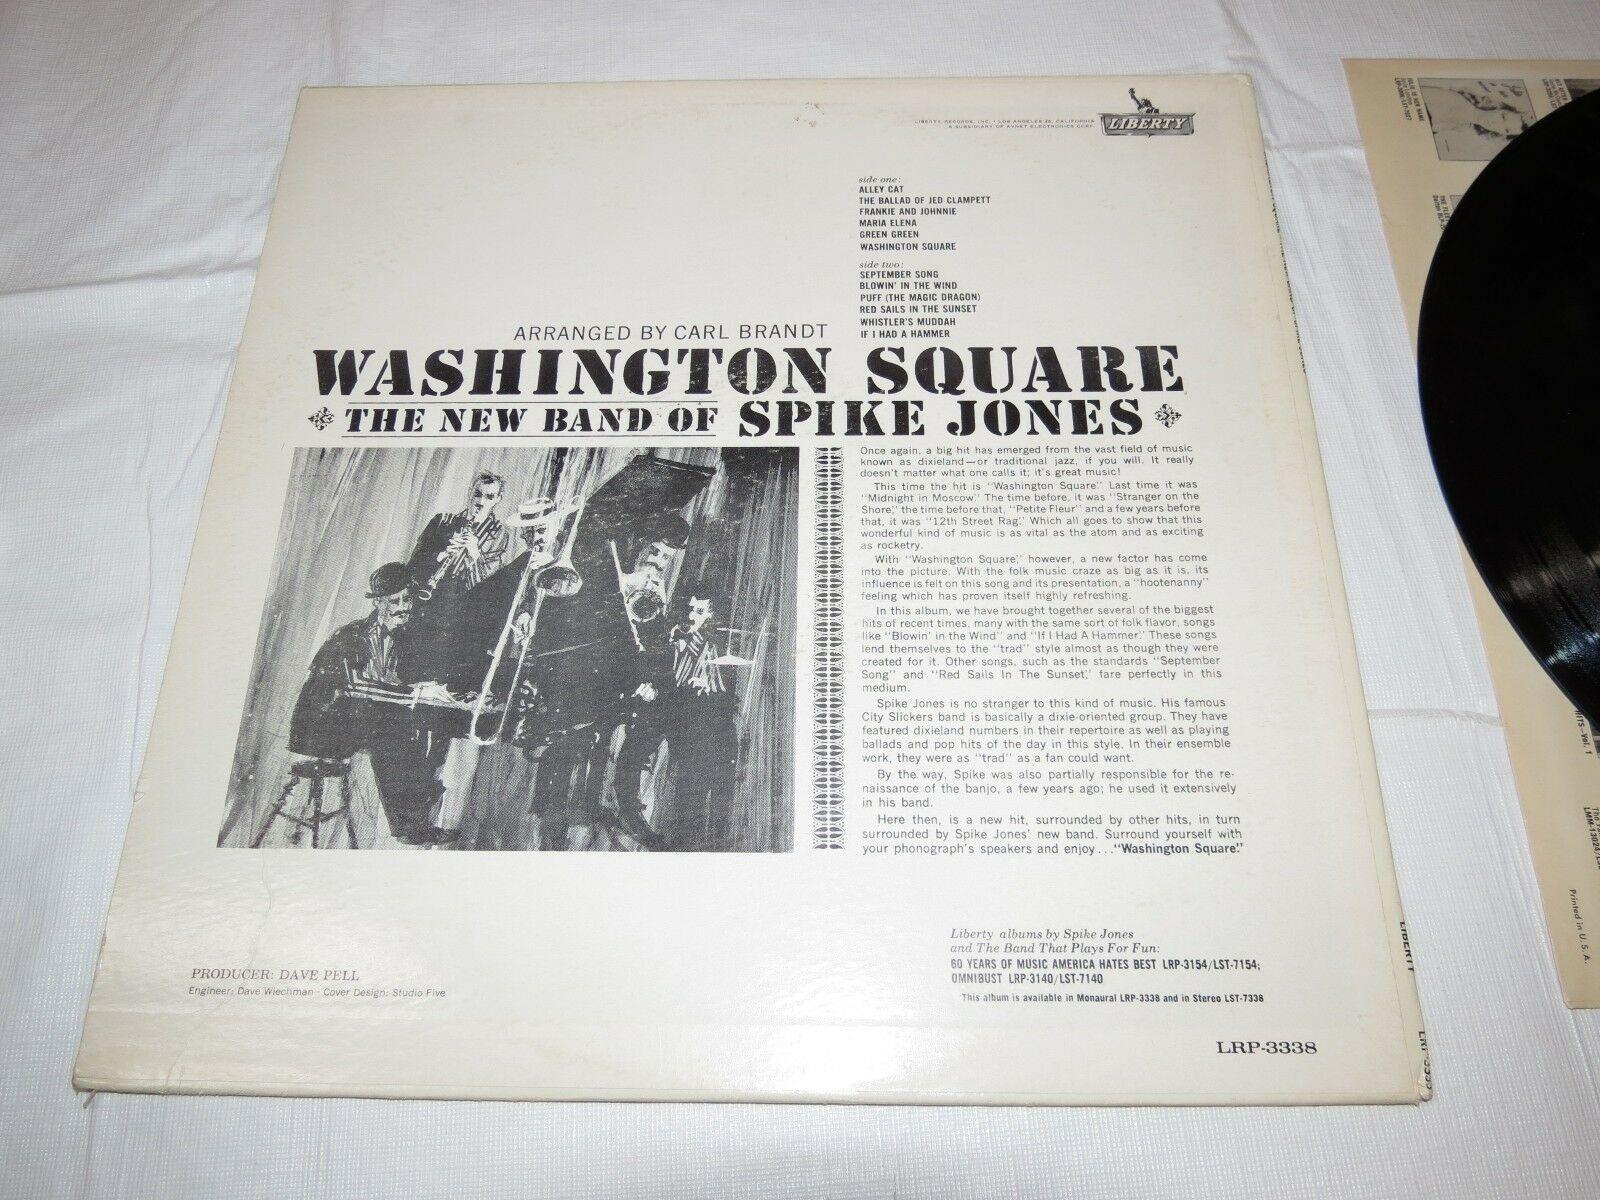 Washington Square The New Band of Spike Jones LRP-3338 Liberty LP Album Record